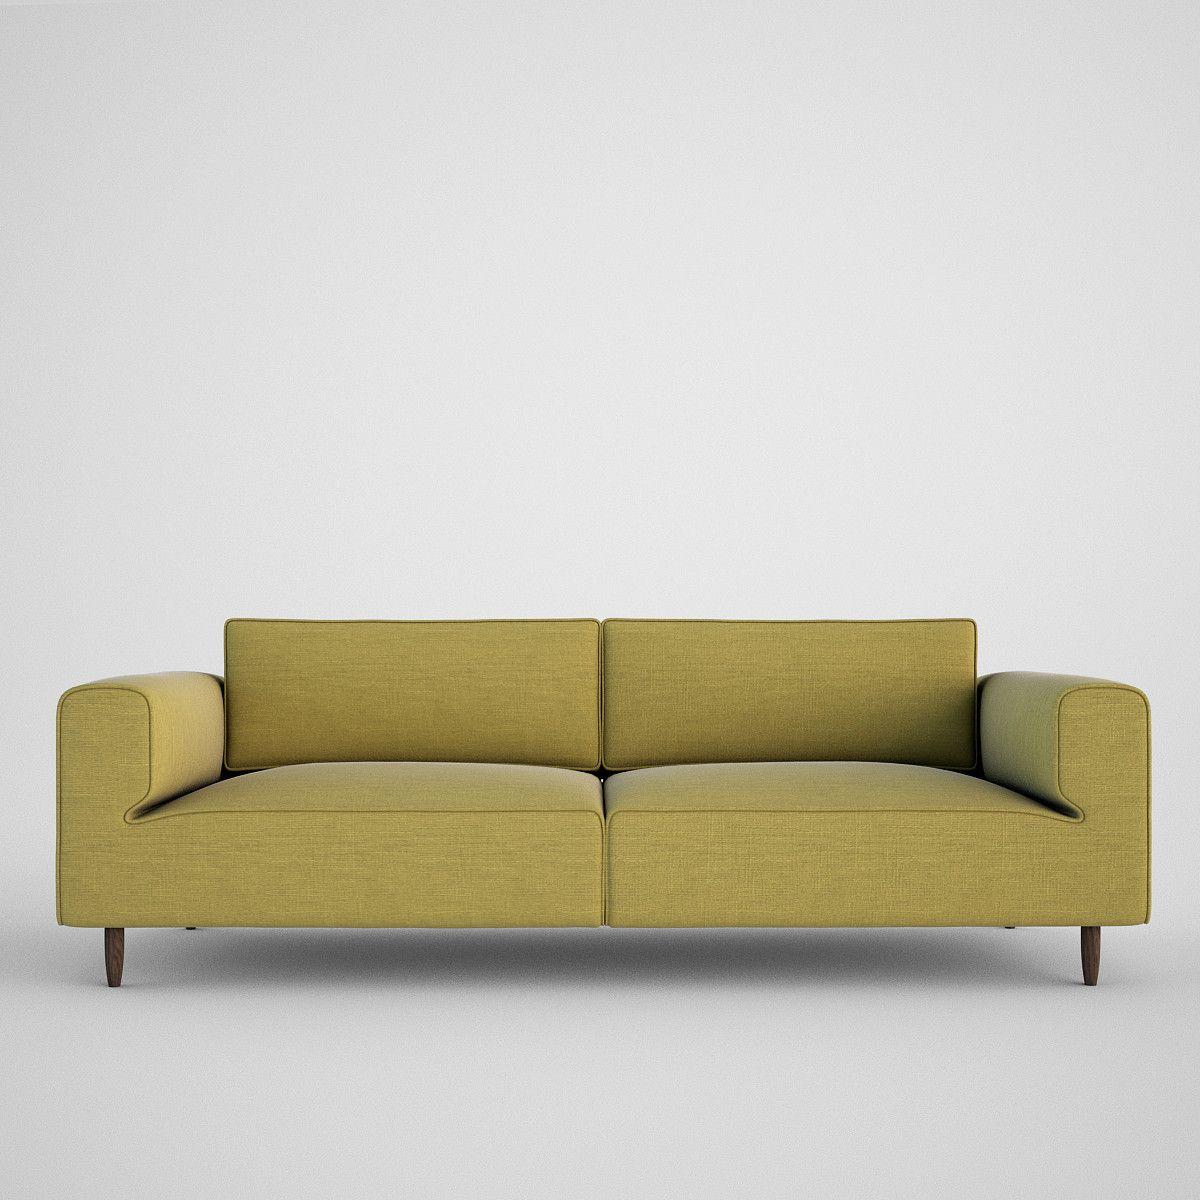 Wonderful Boconcept Sofa Acro